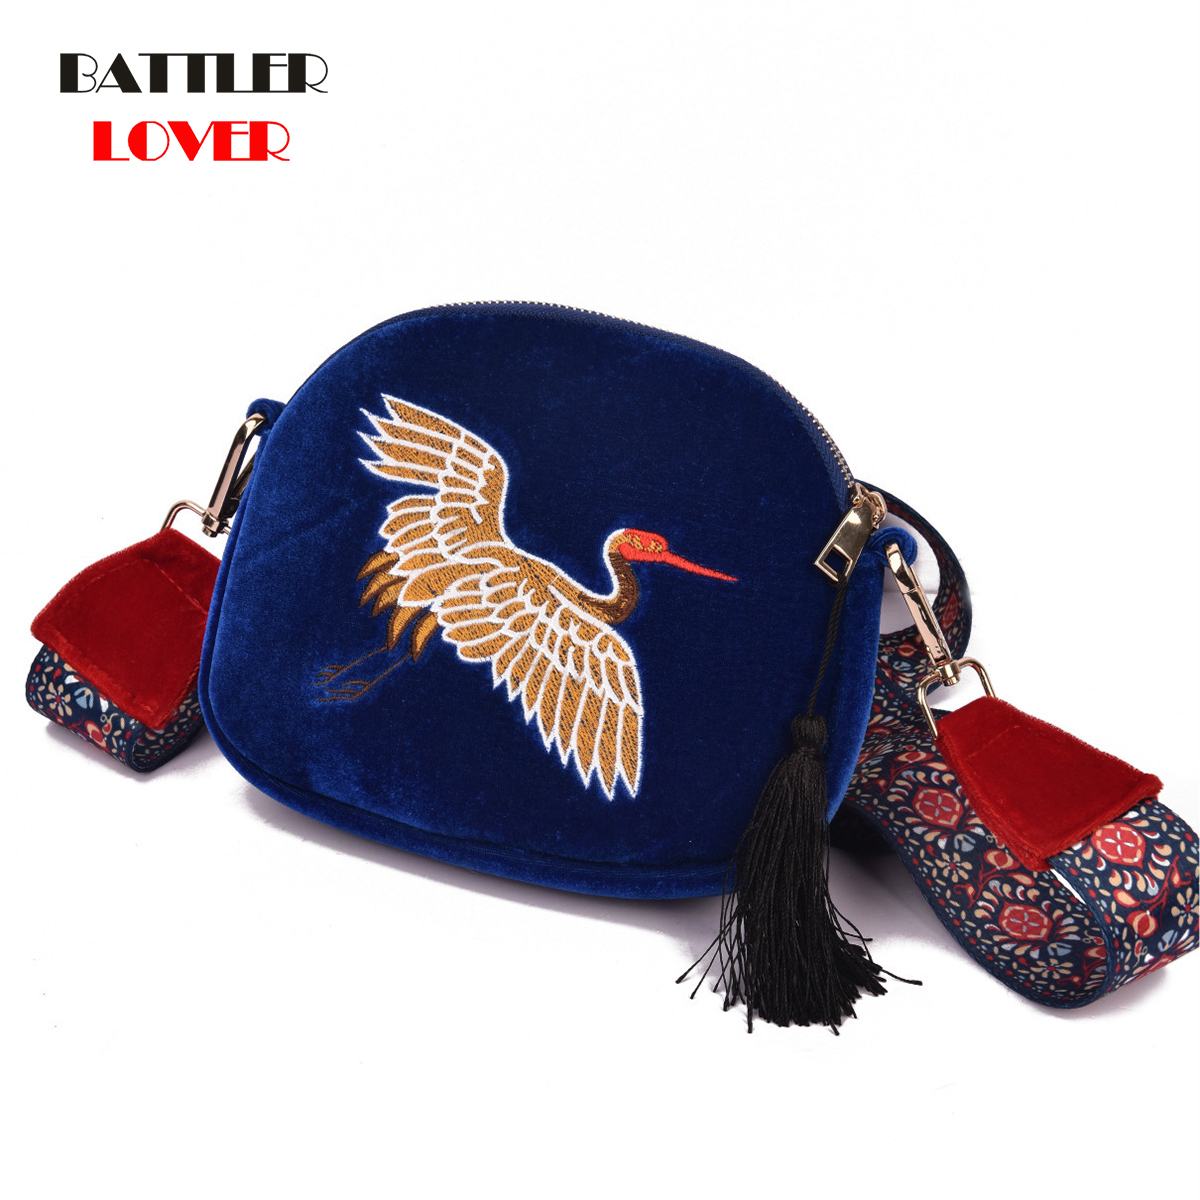 Embroiderry Bags for Women 2019 Bags Women Crossbody Bag Bolsa Feminina Shoulder Messenger Bag Luxury Handbags Womens Designer